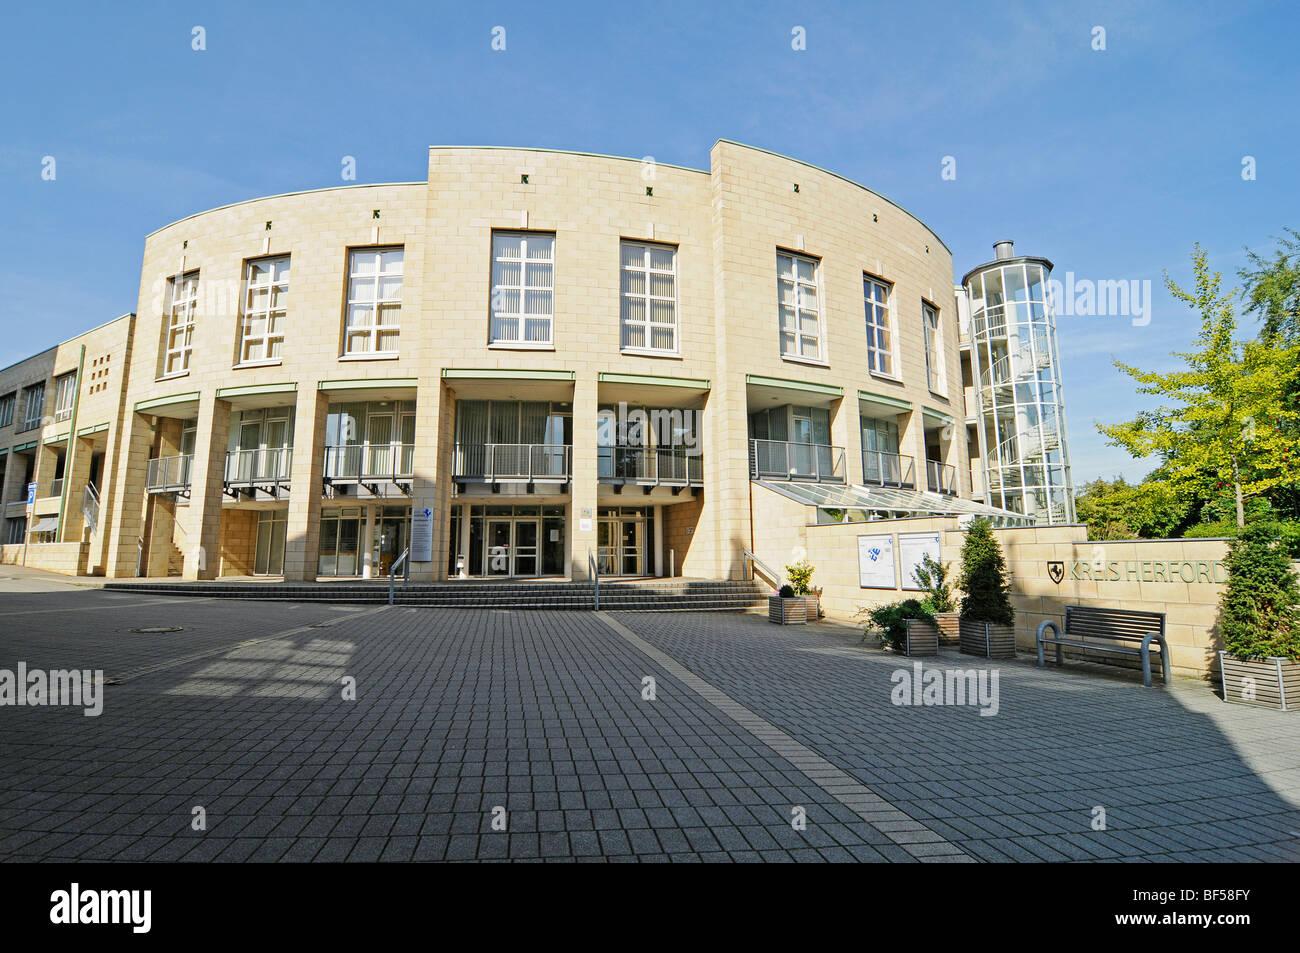 Local administration and management building, Herford, Eastern Westphalia, North Rhine-Westphalia, Germany, Europe - Stock Image